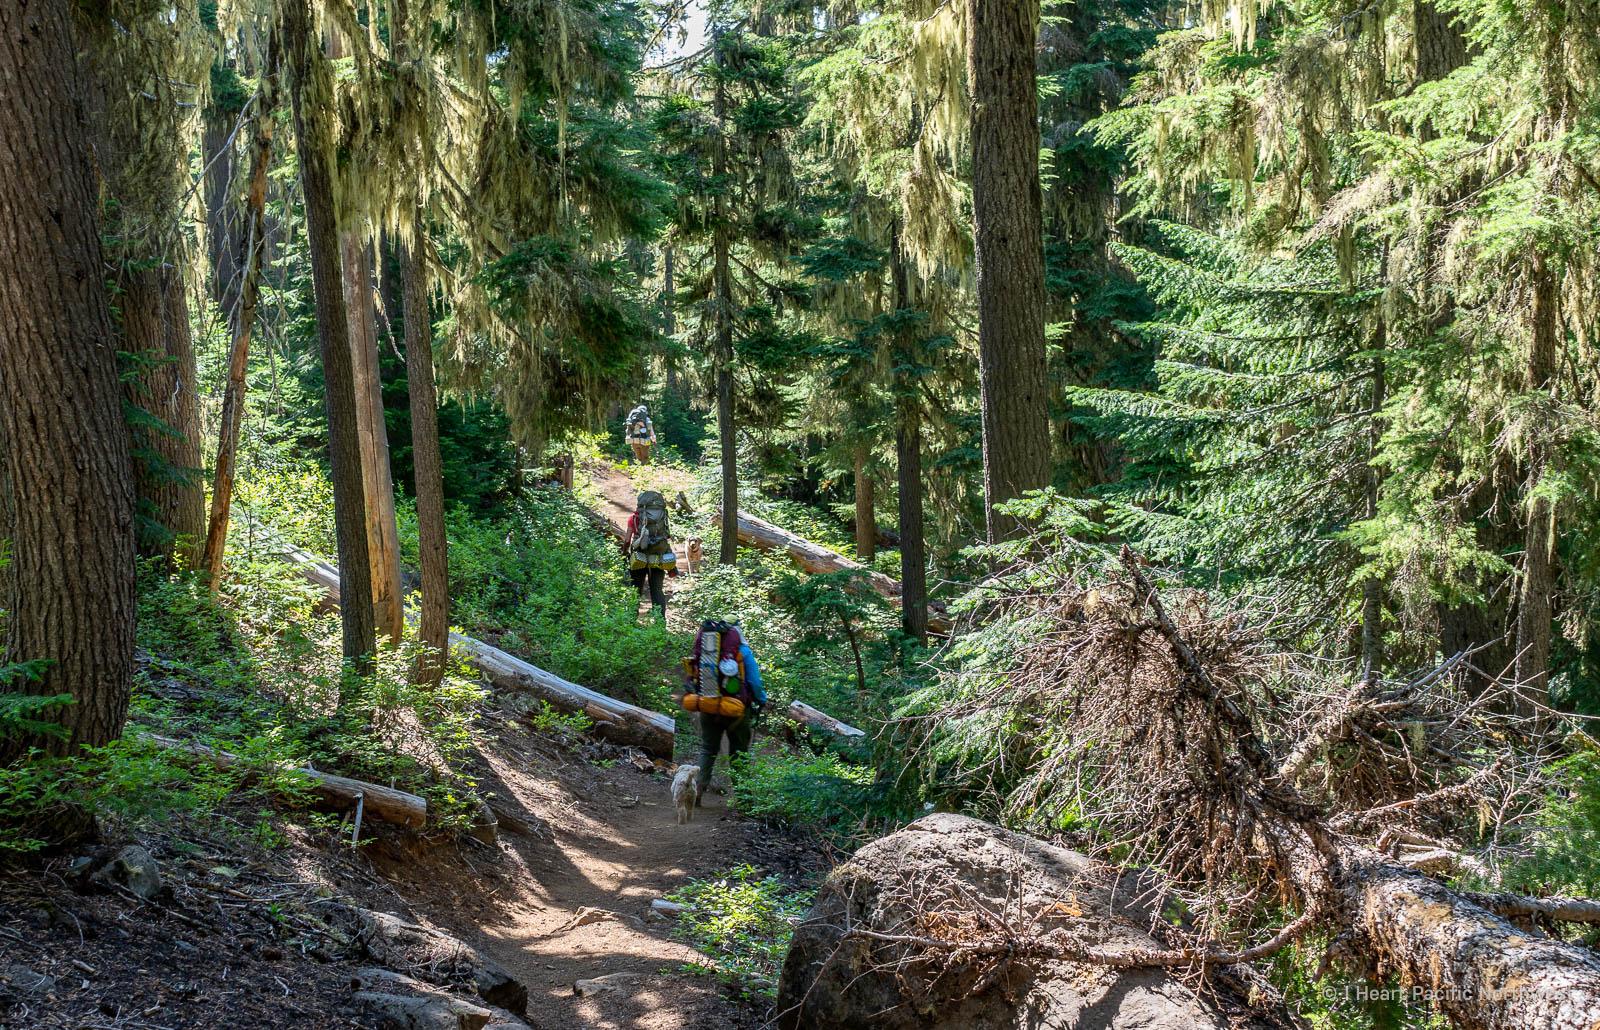 Mount Washington Wilderness - Tenas Lakes backpack trip